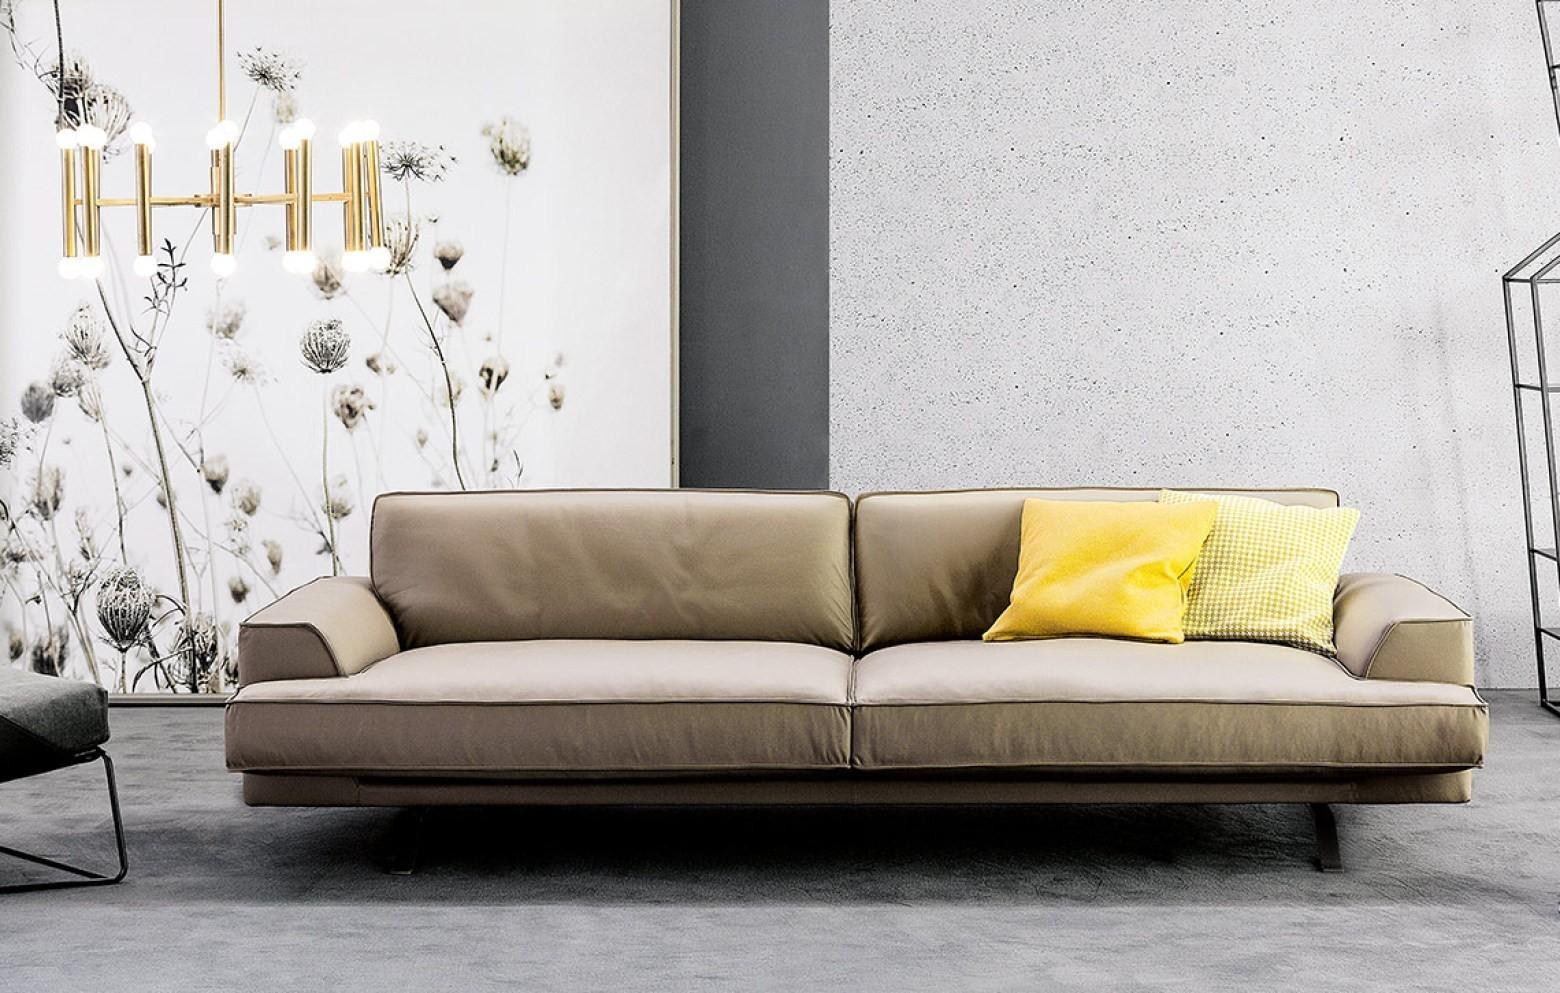 italienische designer sofas. Black Bedroom Furniture Sets. Home Design Ideas